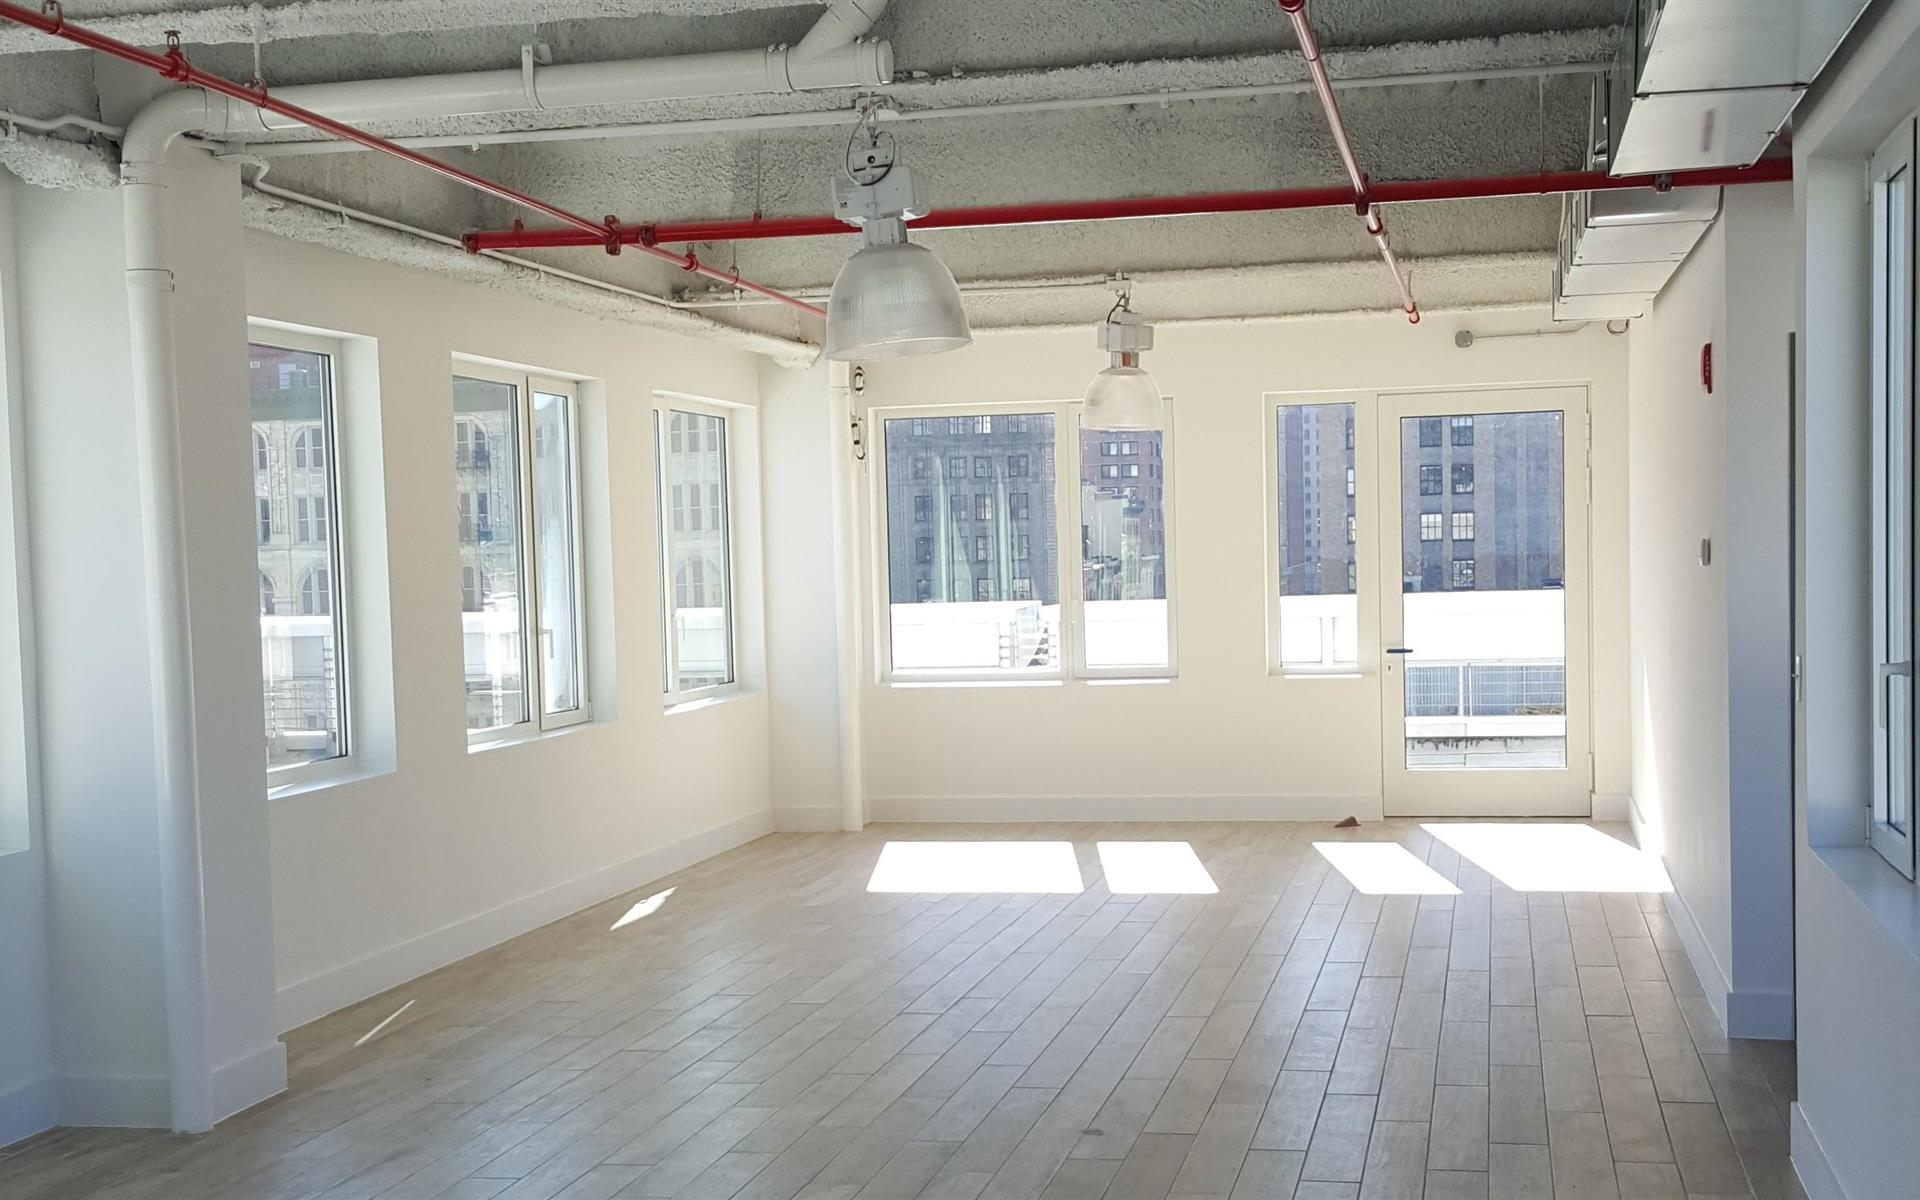 Cubico- Soho - SoHo Studio Loft Workspace